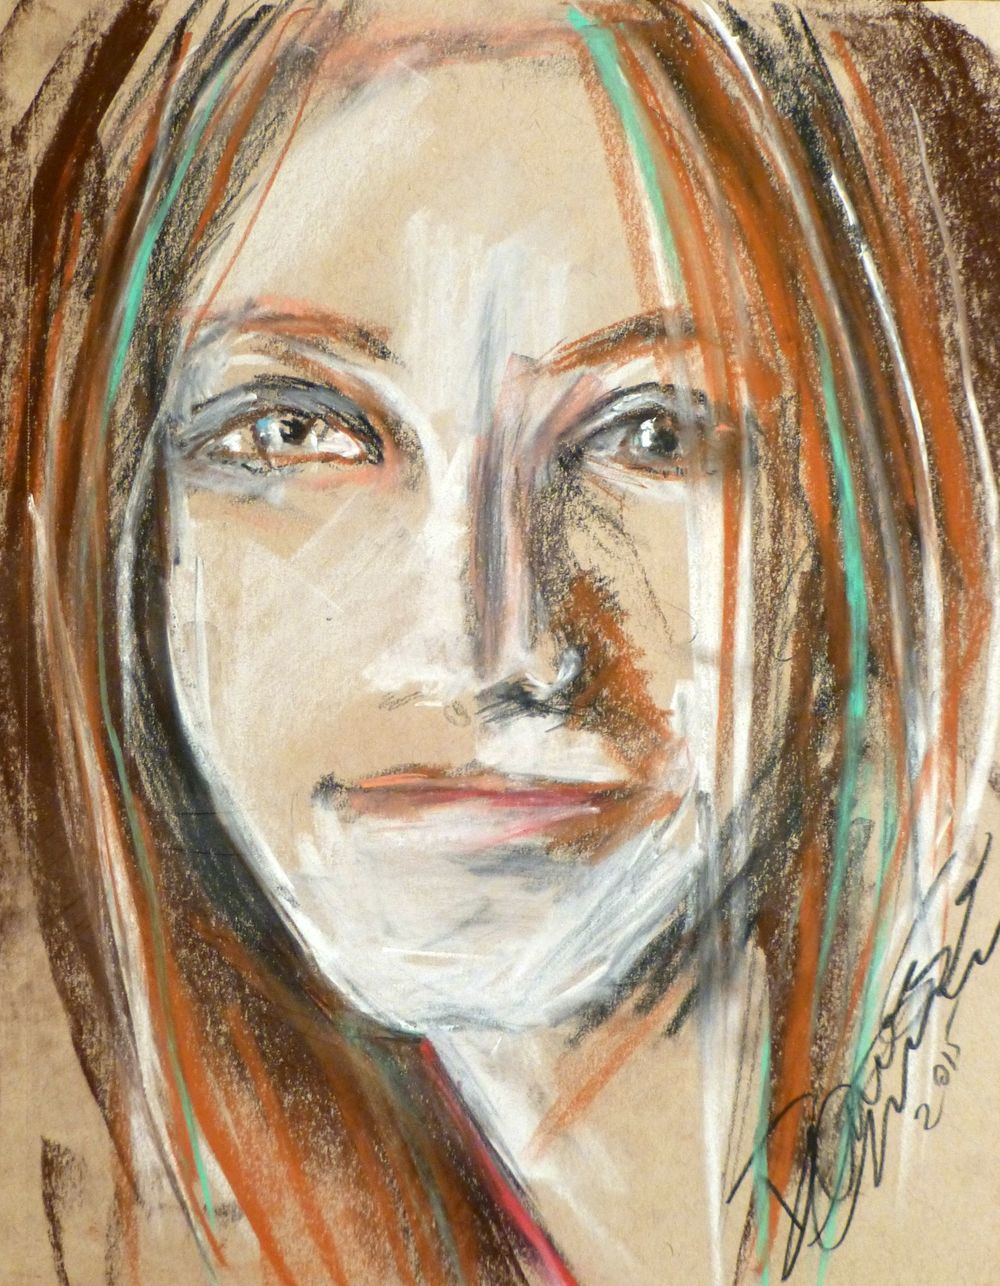 Lindsey-sketch-2015.jpg